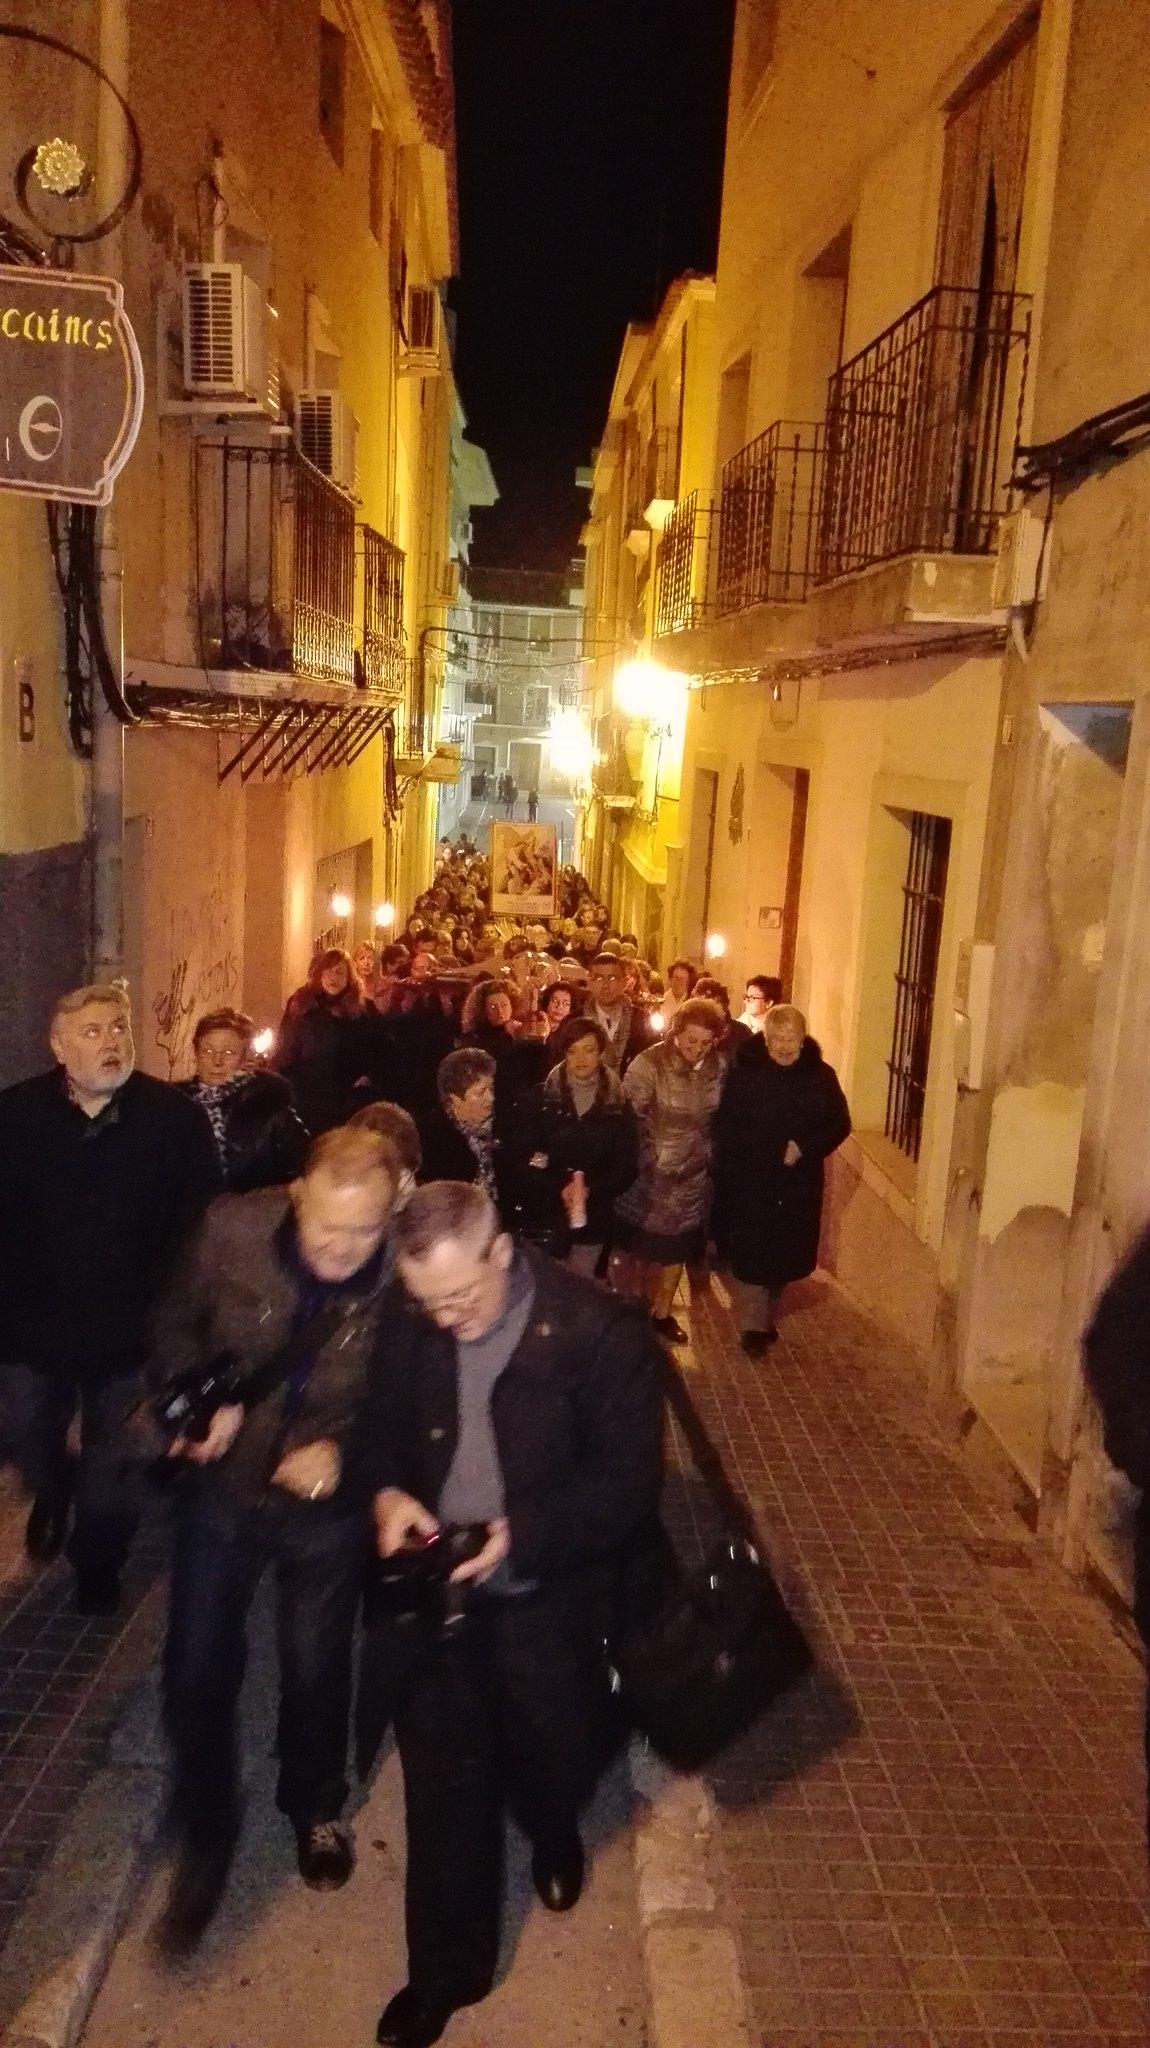 (2016-03-18) - VII Vía Crucis nocturno - Javier Romero Ripoll (080)